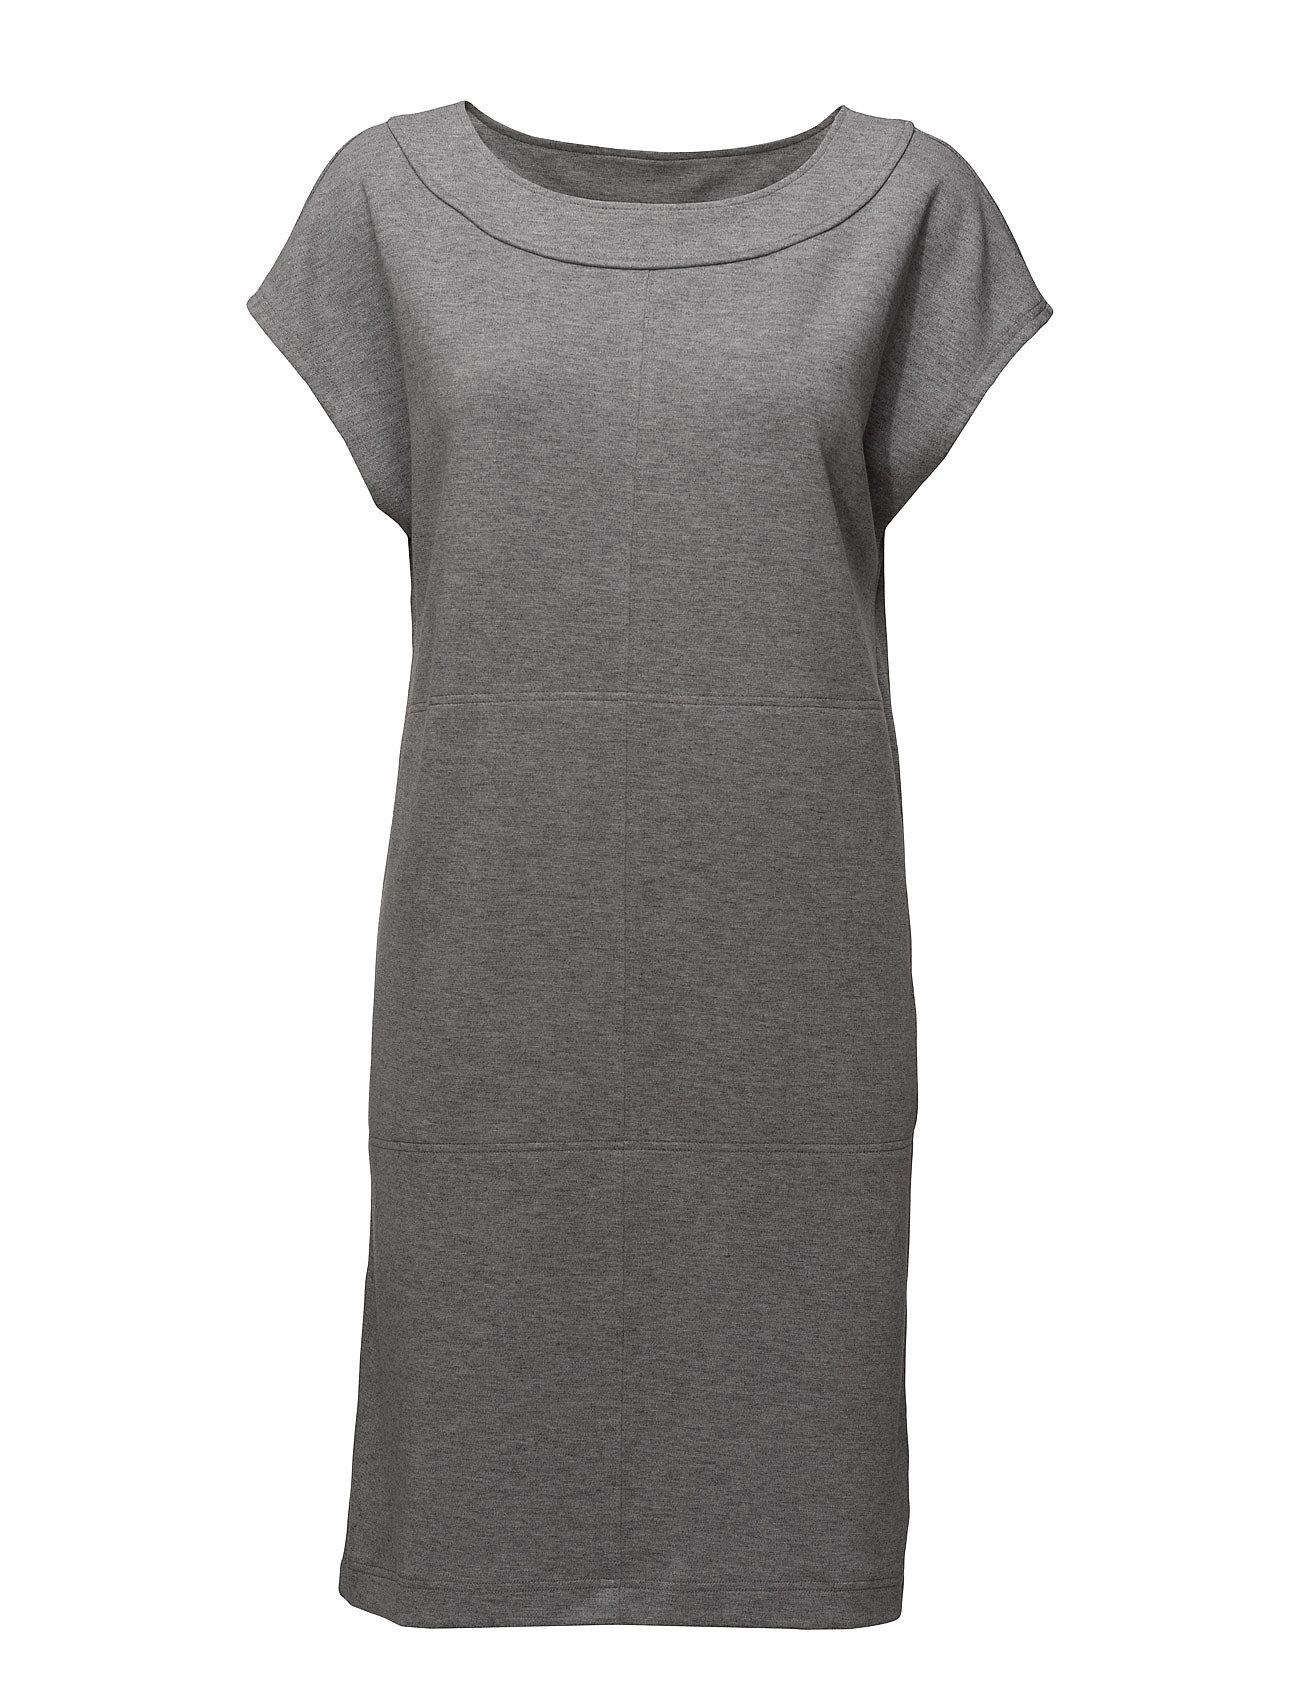 nanso – Ladies dress, huurre på boozt.com dk